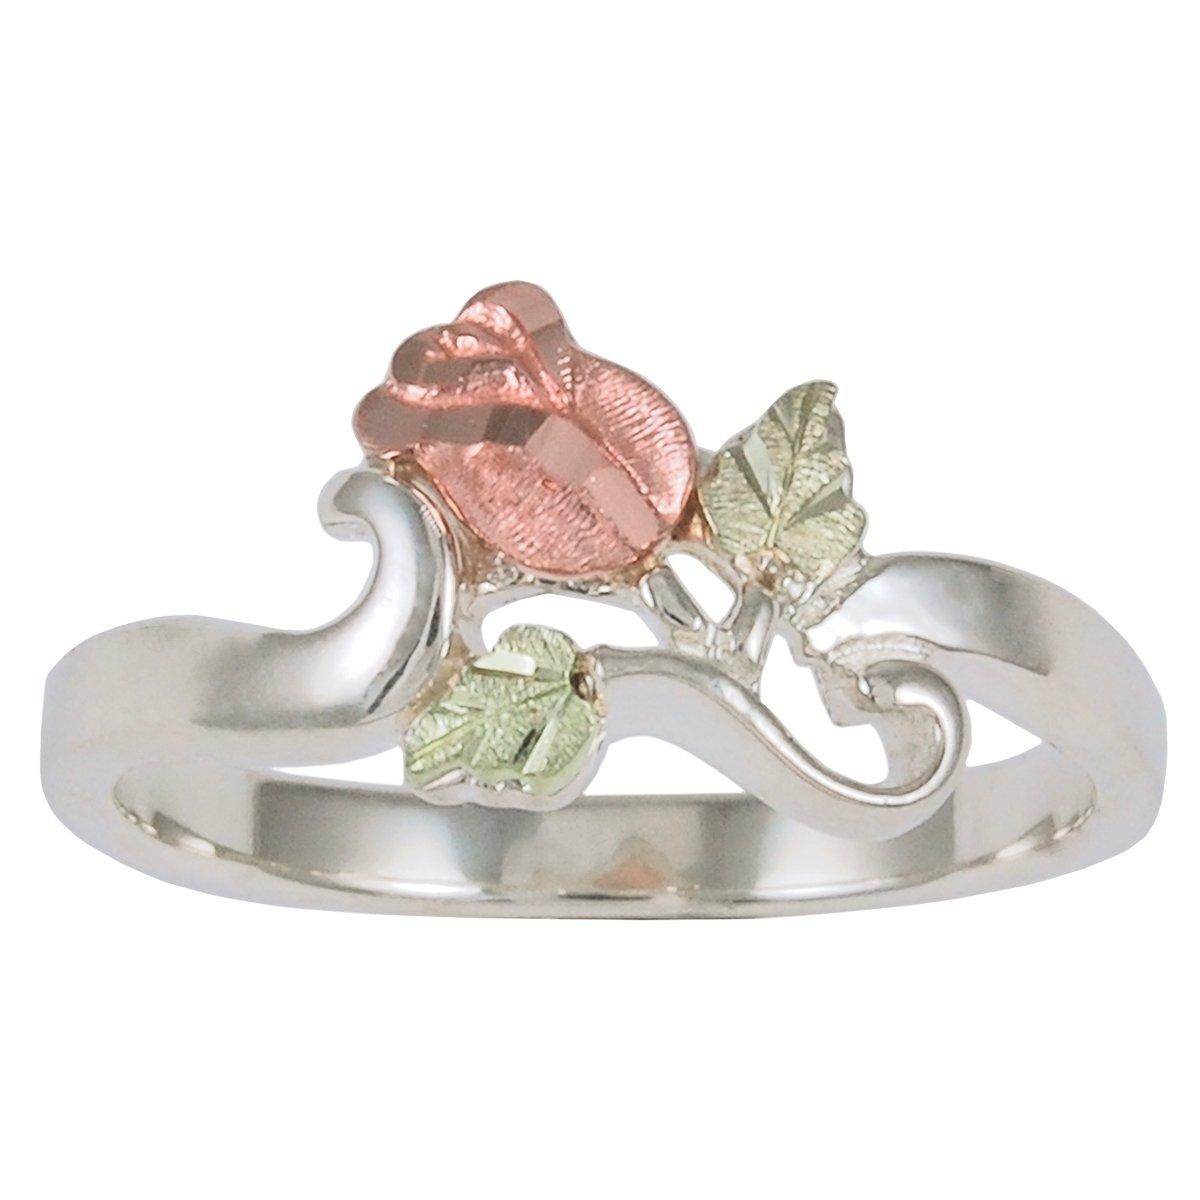 Petite Rose Ring, Sterling Silver, 12k Green and Rose Gold Black Hills Gold Motif, Size 7